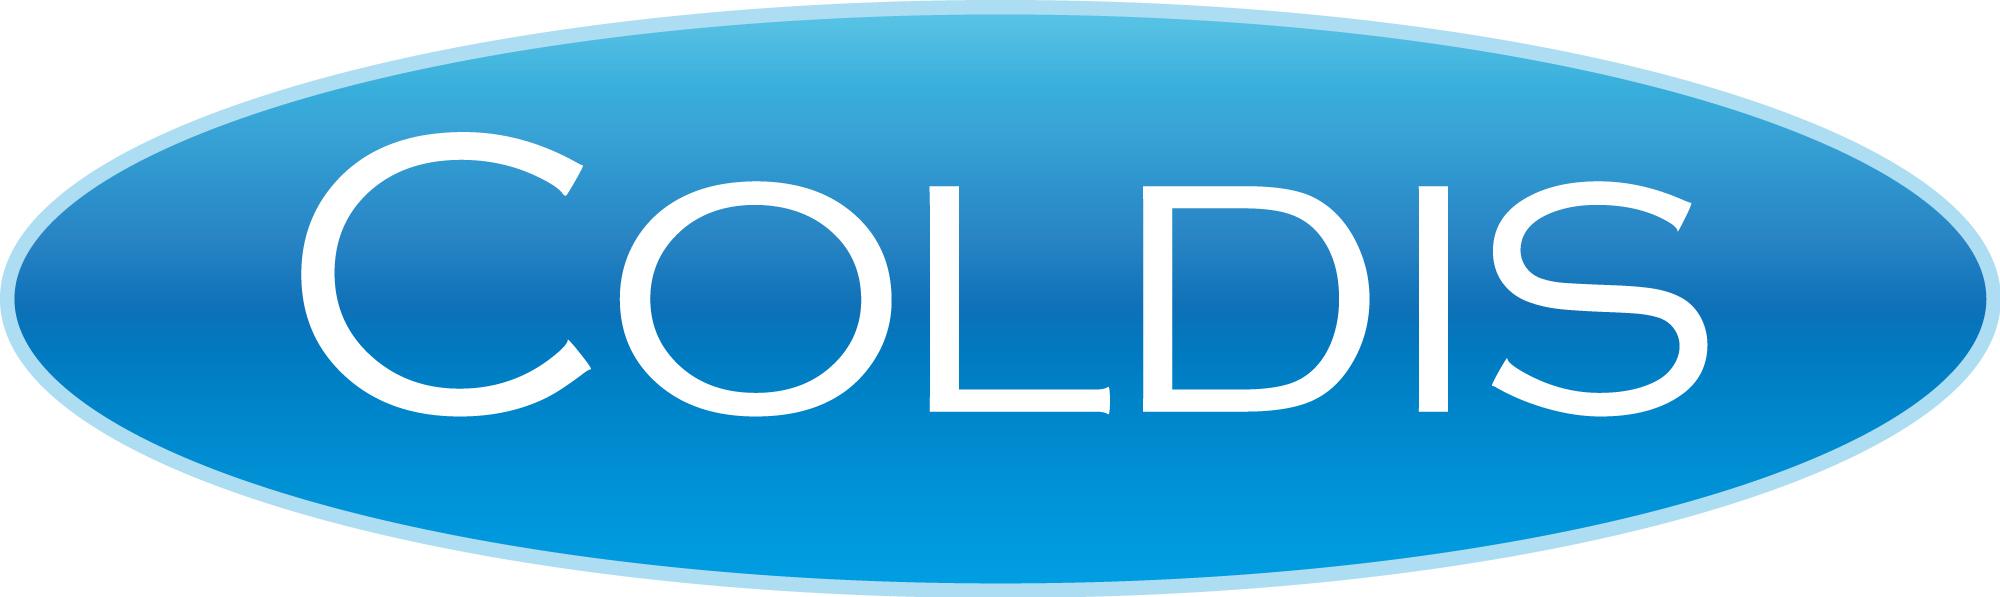 COLDIS